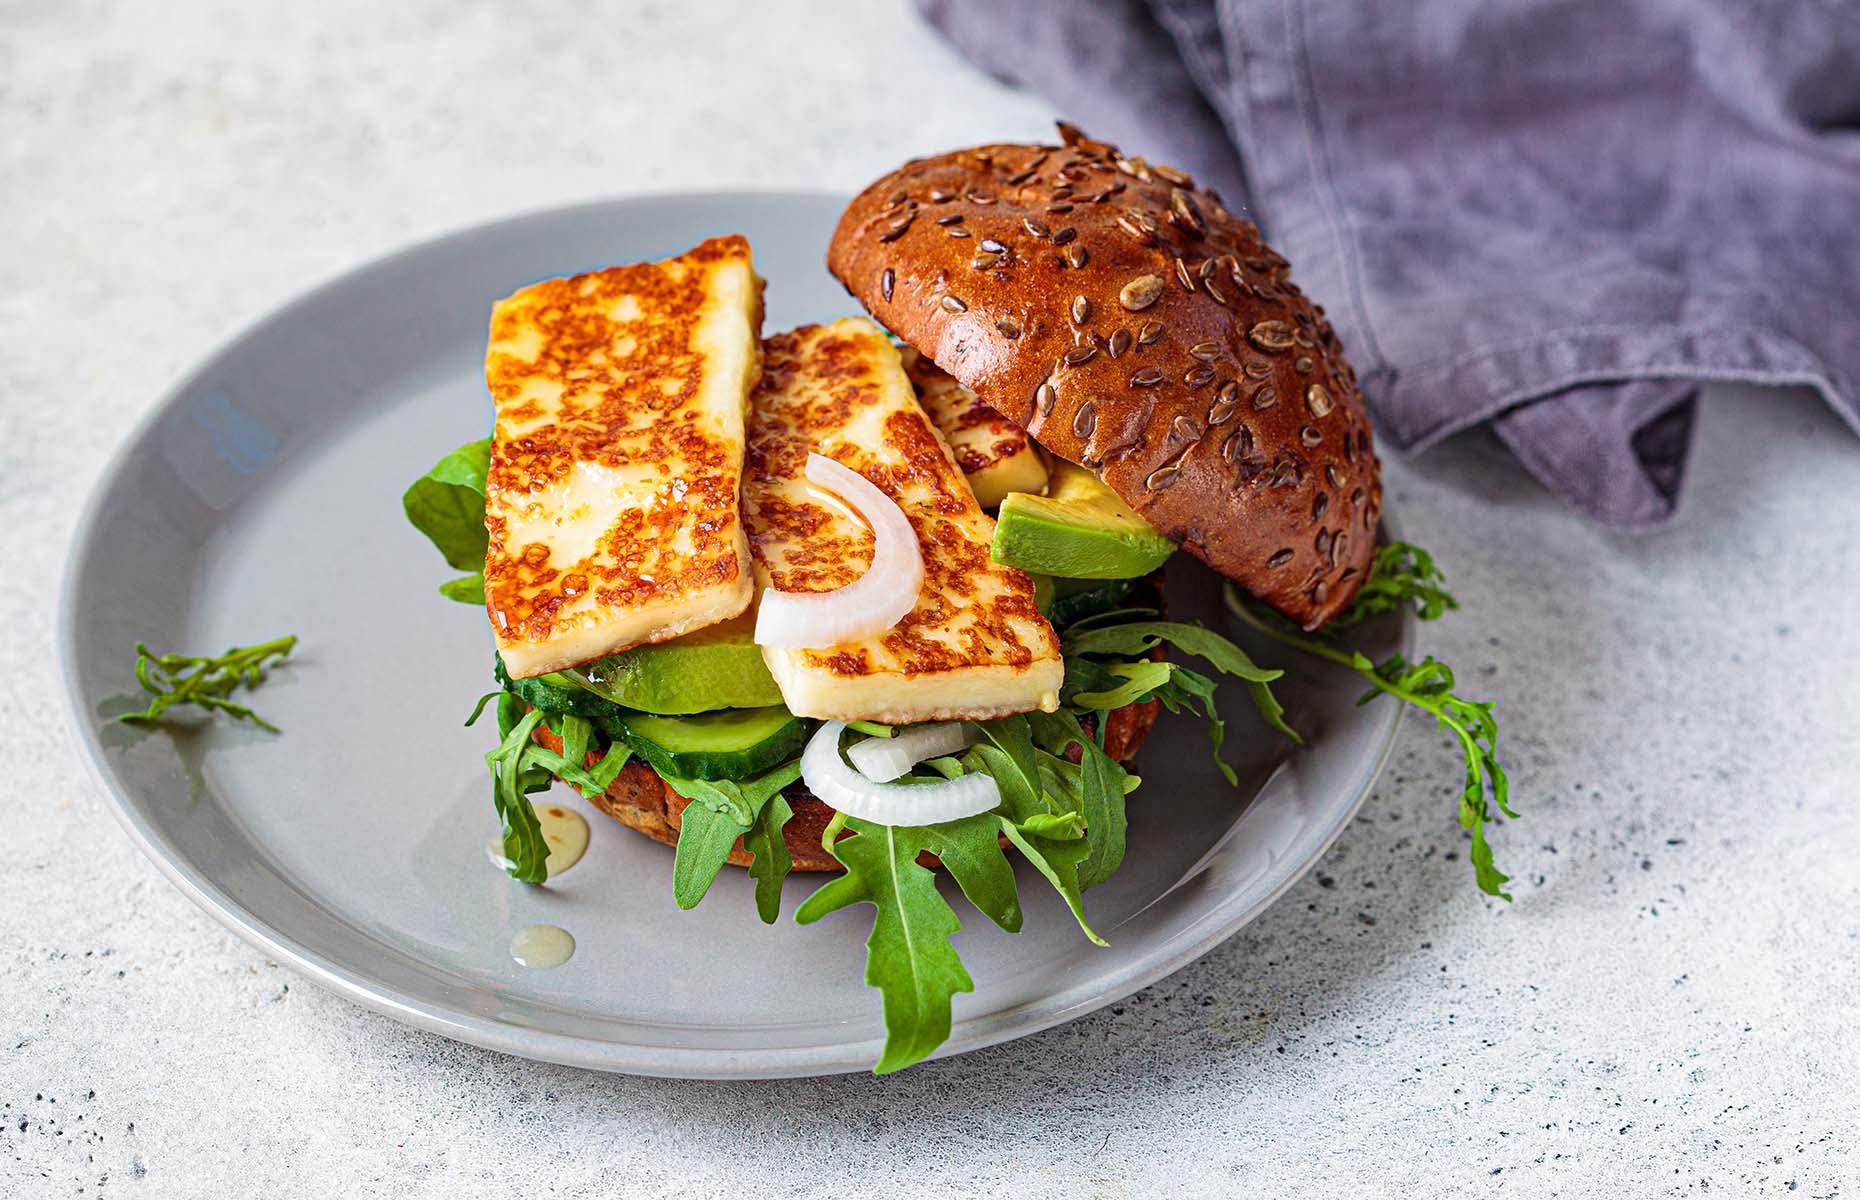 Halloumi in a veggie burger (Image: Nina Fisova/Shutterstock)